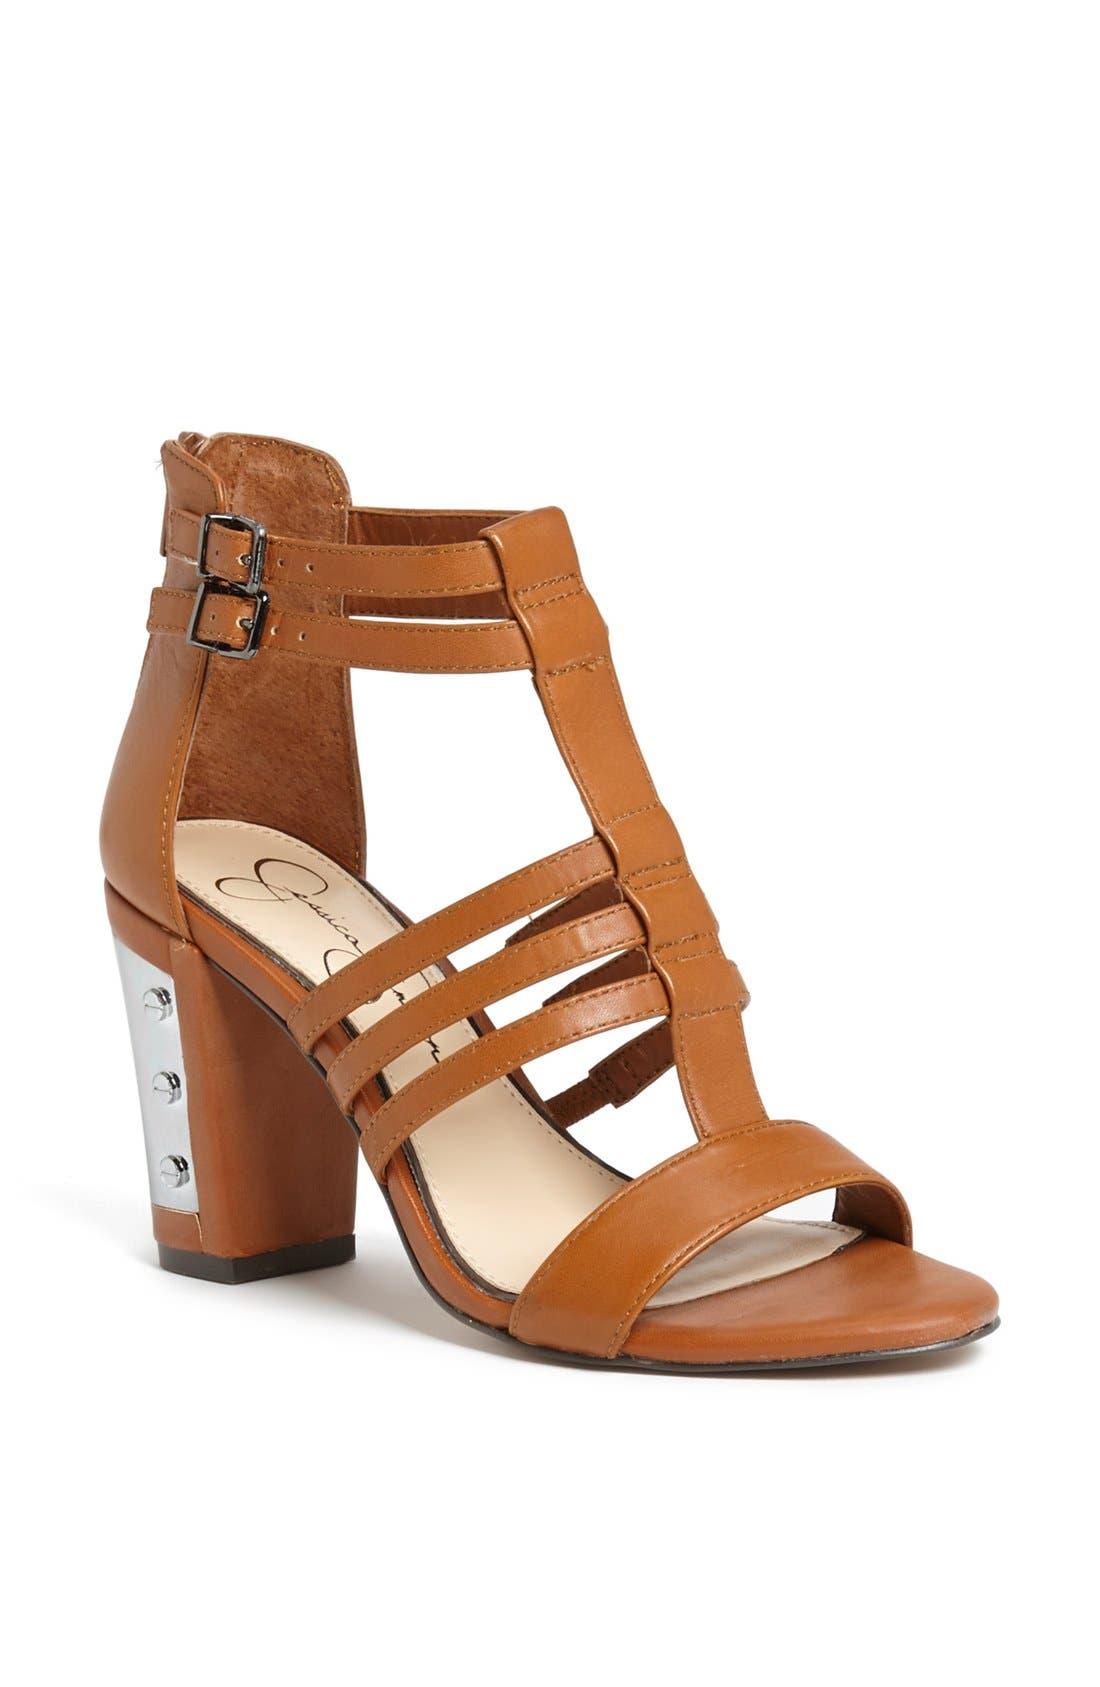 Main Image - Jessica Simpson 'Jennisin' Leather Sandal